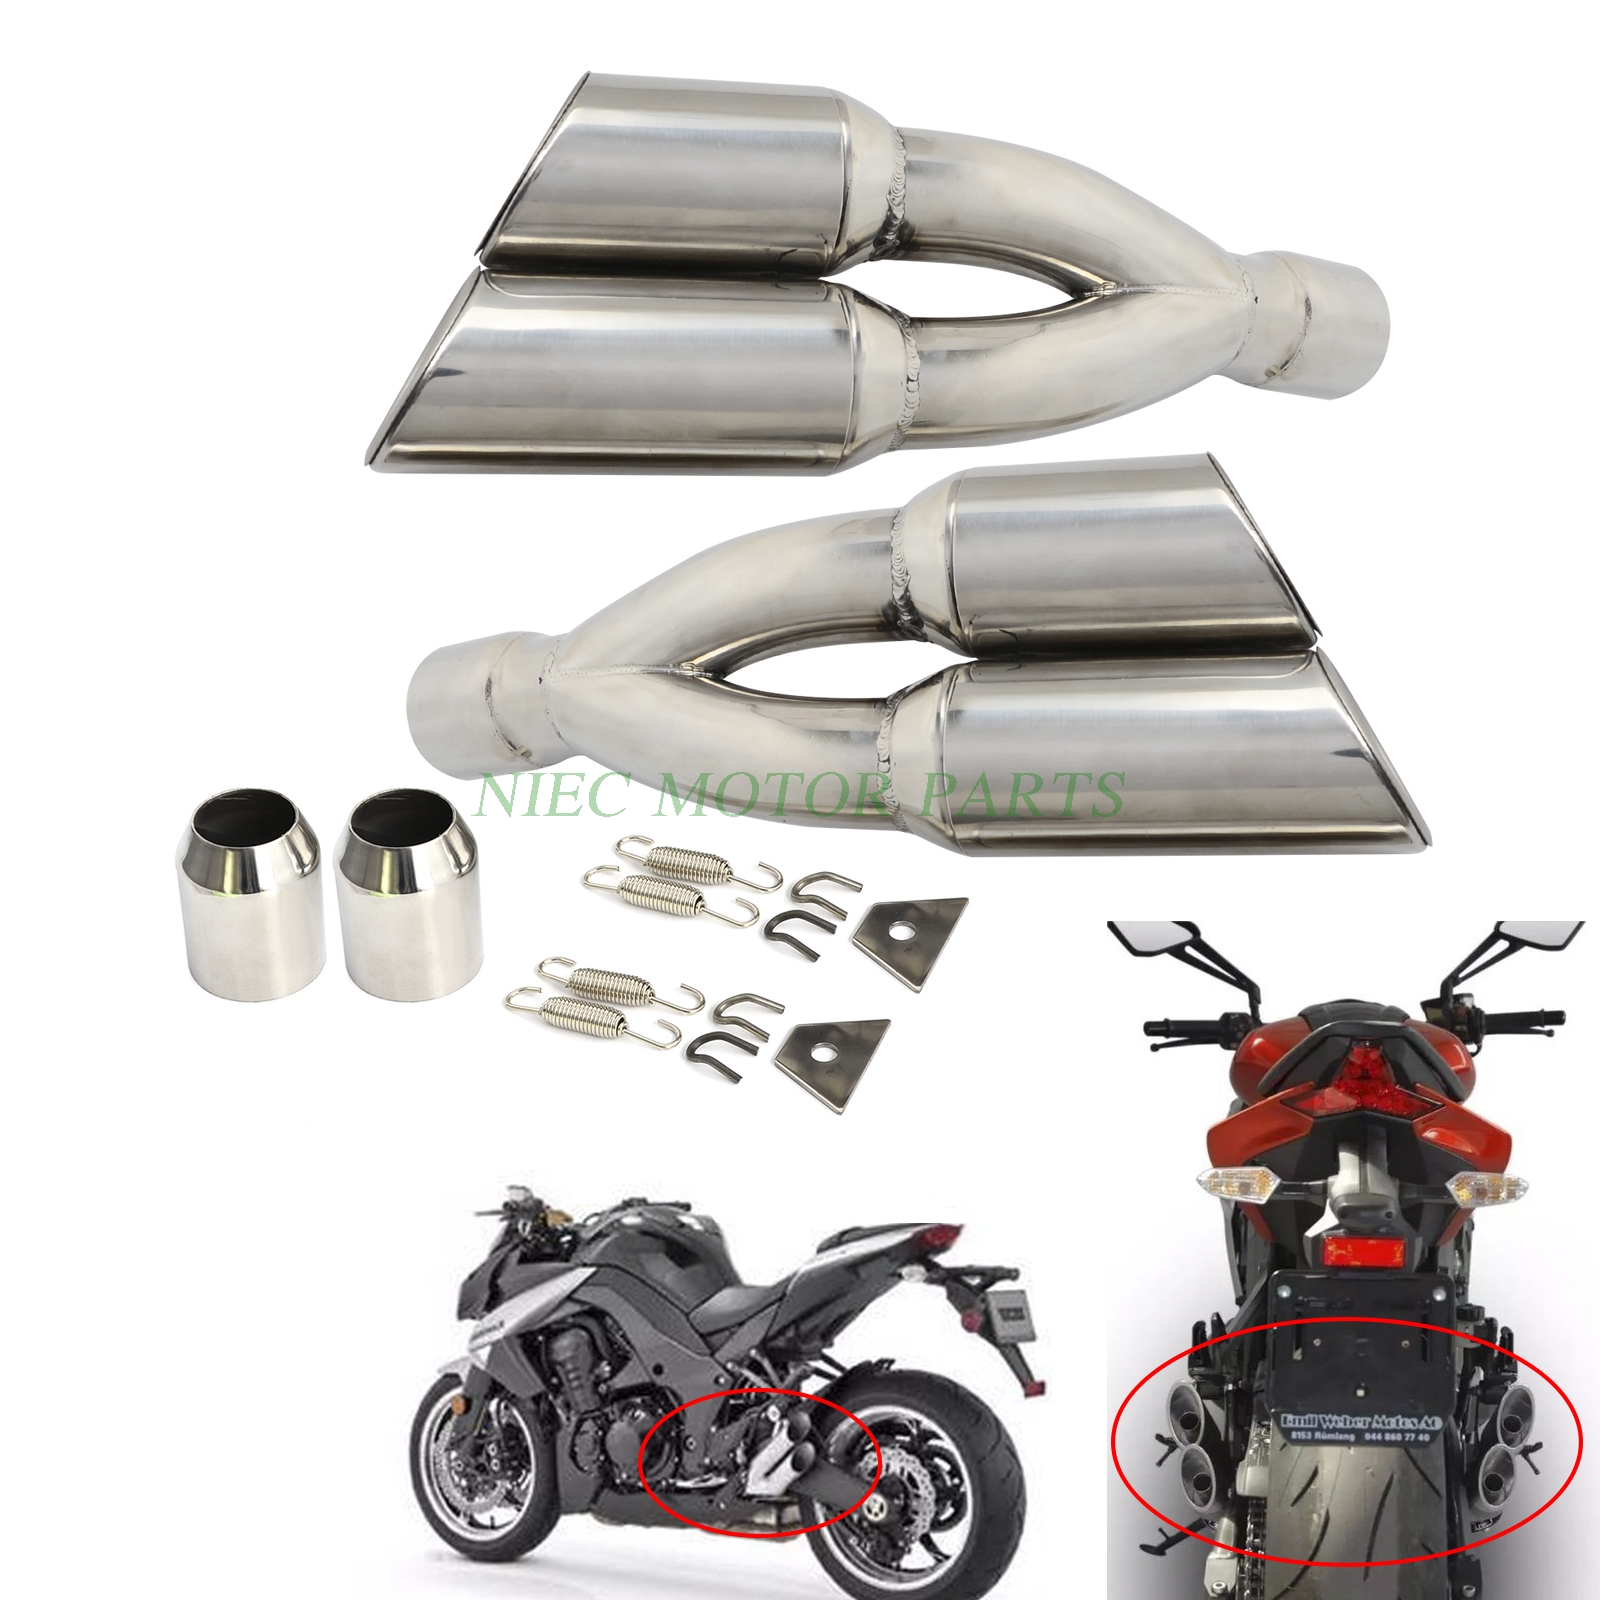 ФОТО Universal Dual Exhaust Muffler Pipe Slip On For Motorcycle Motocross Supermoto Street Bike Scooter ATV Quad Dirt Bike Off Road